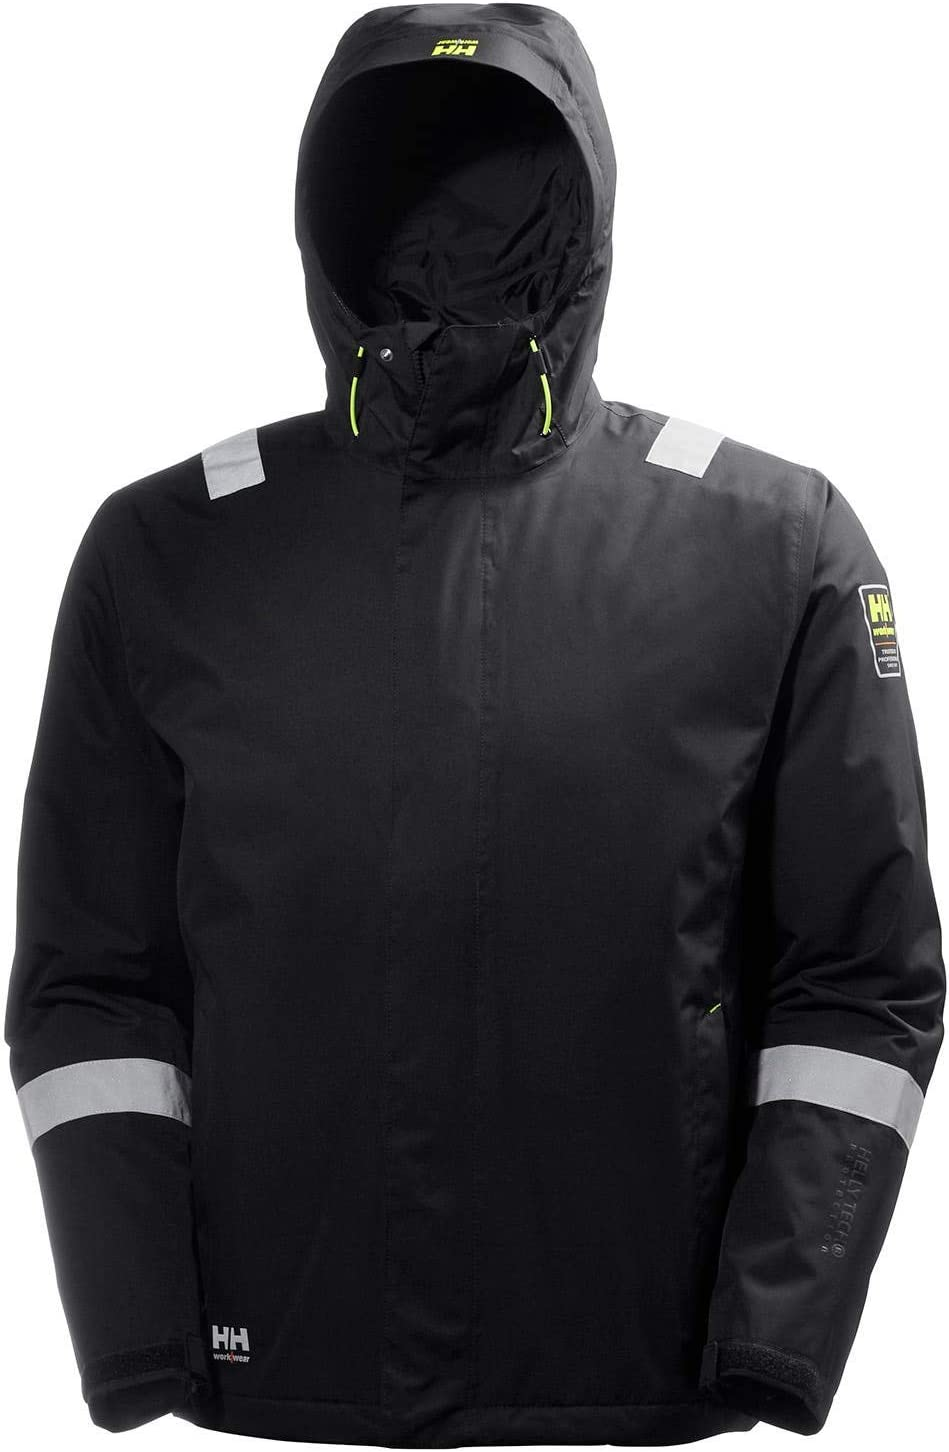 Helly Hansen 71351/_999-XS Aker Winter Jacket X-Small Black